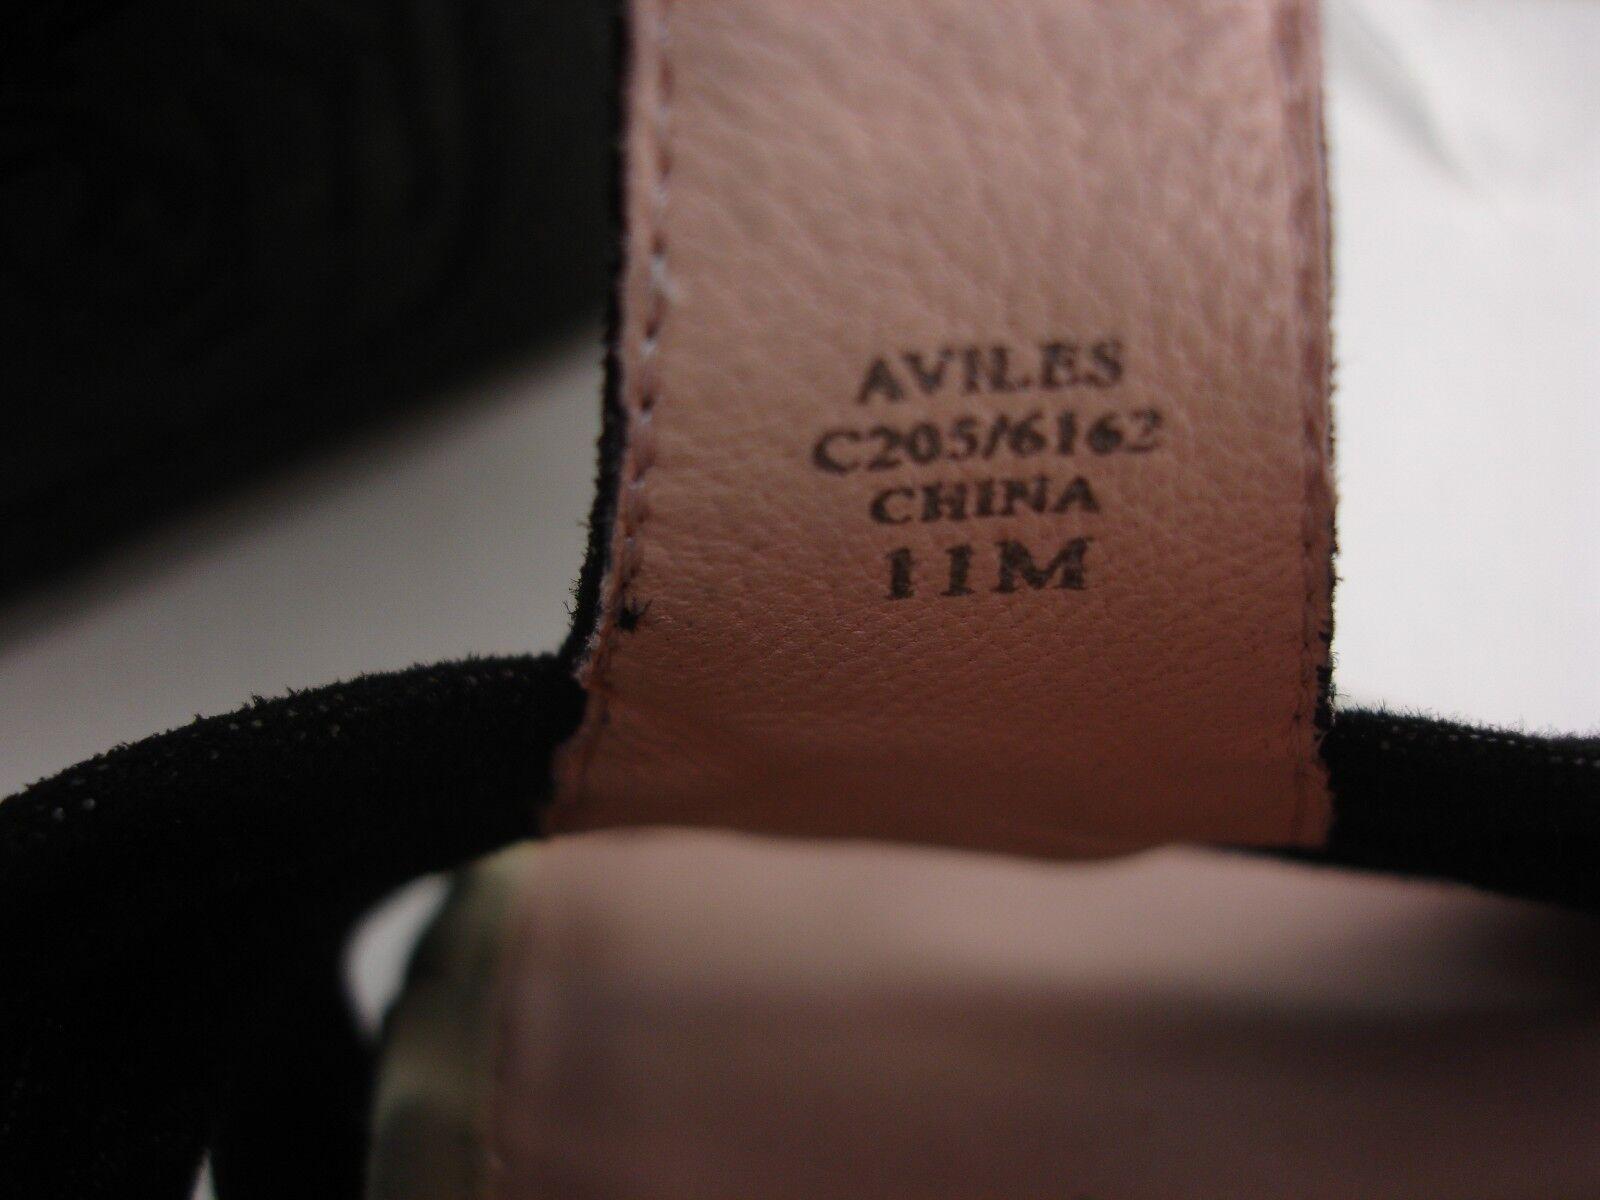 TARYN pink ALIVES BLACK SHIMMER SUEDE WEDGES T-STRAP T-STRAP T-STRAP SANDALS WOMEN'S 11 M 6adb24